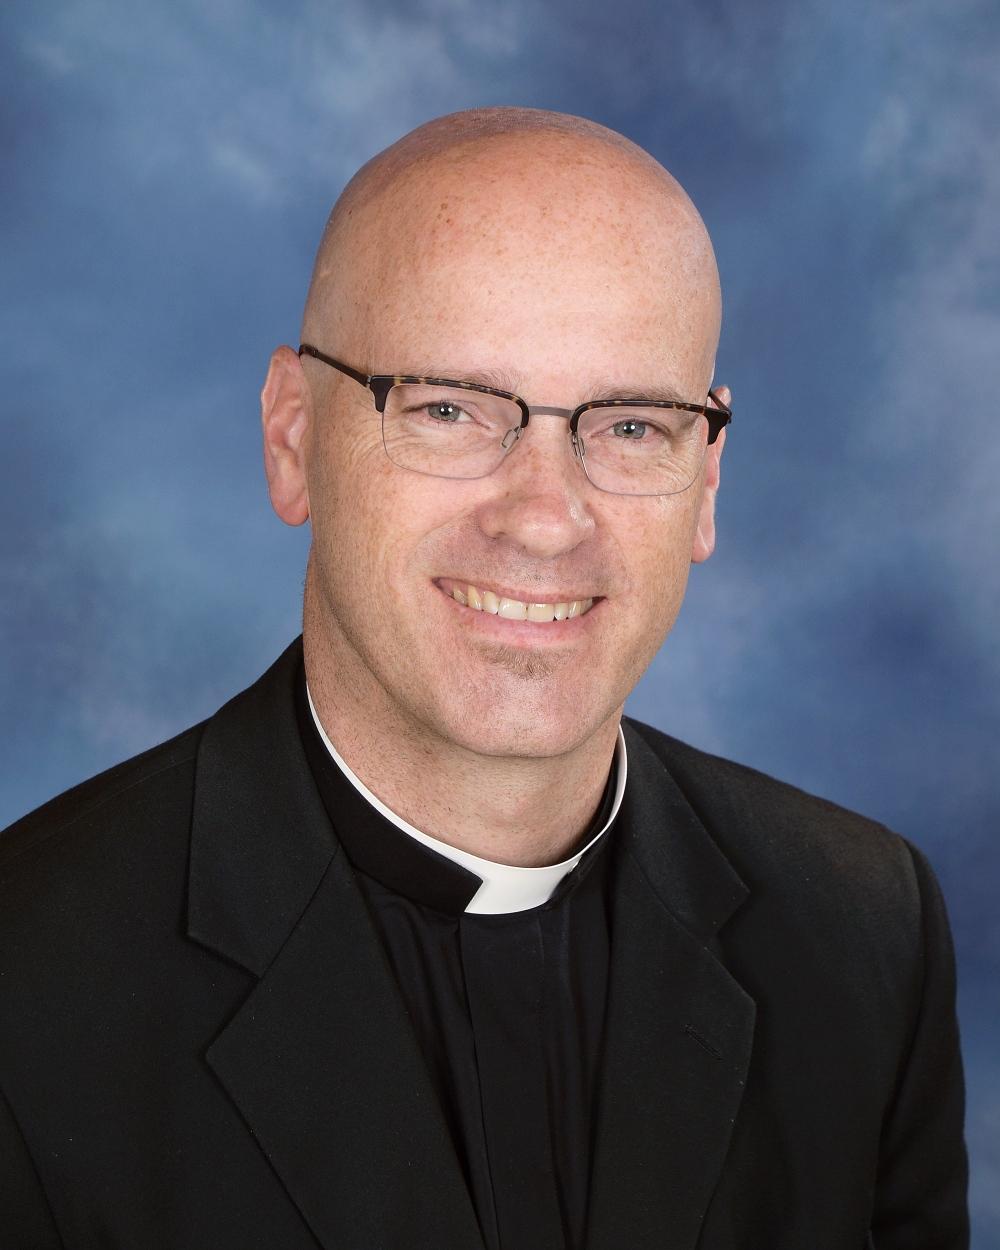 Father Todd Strange